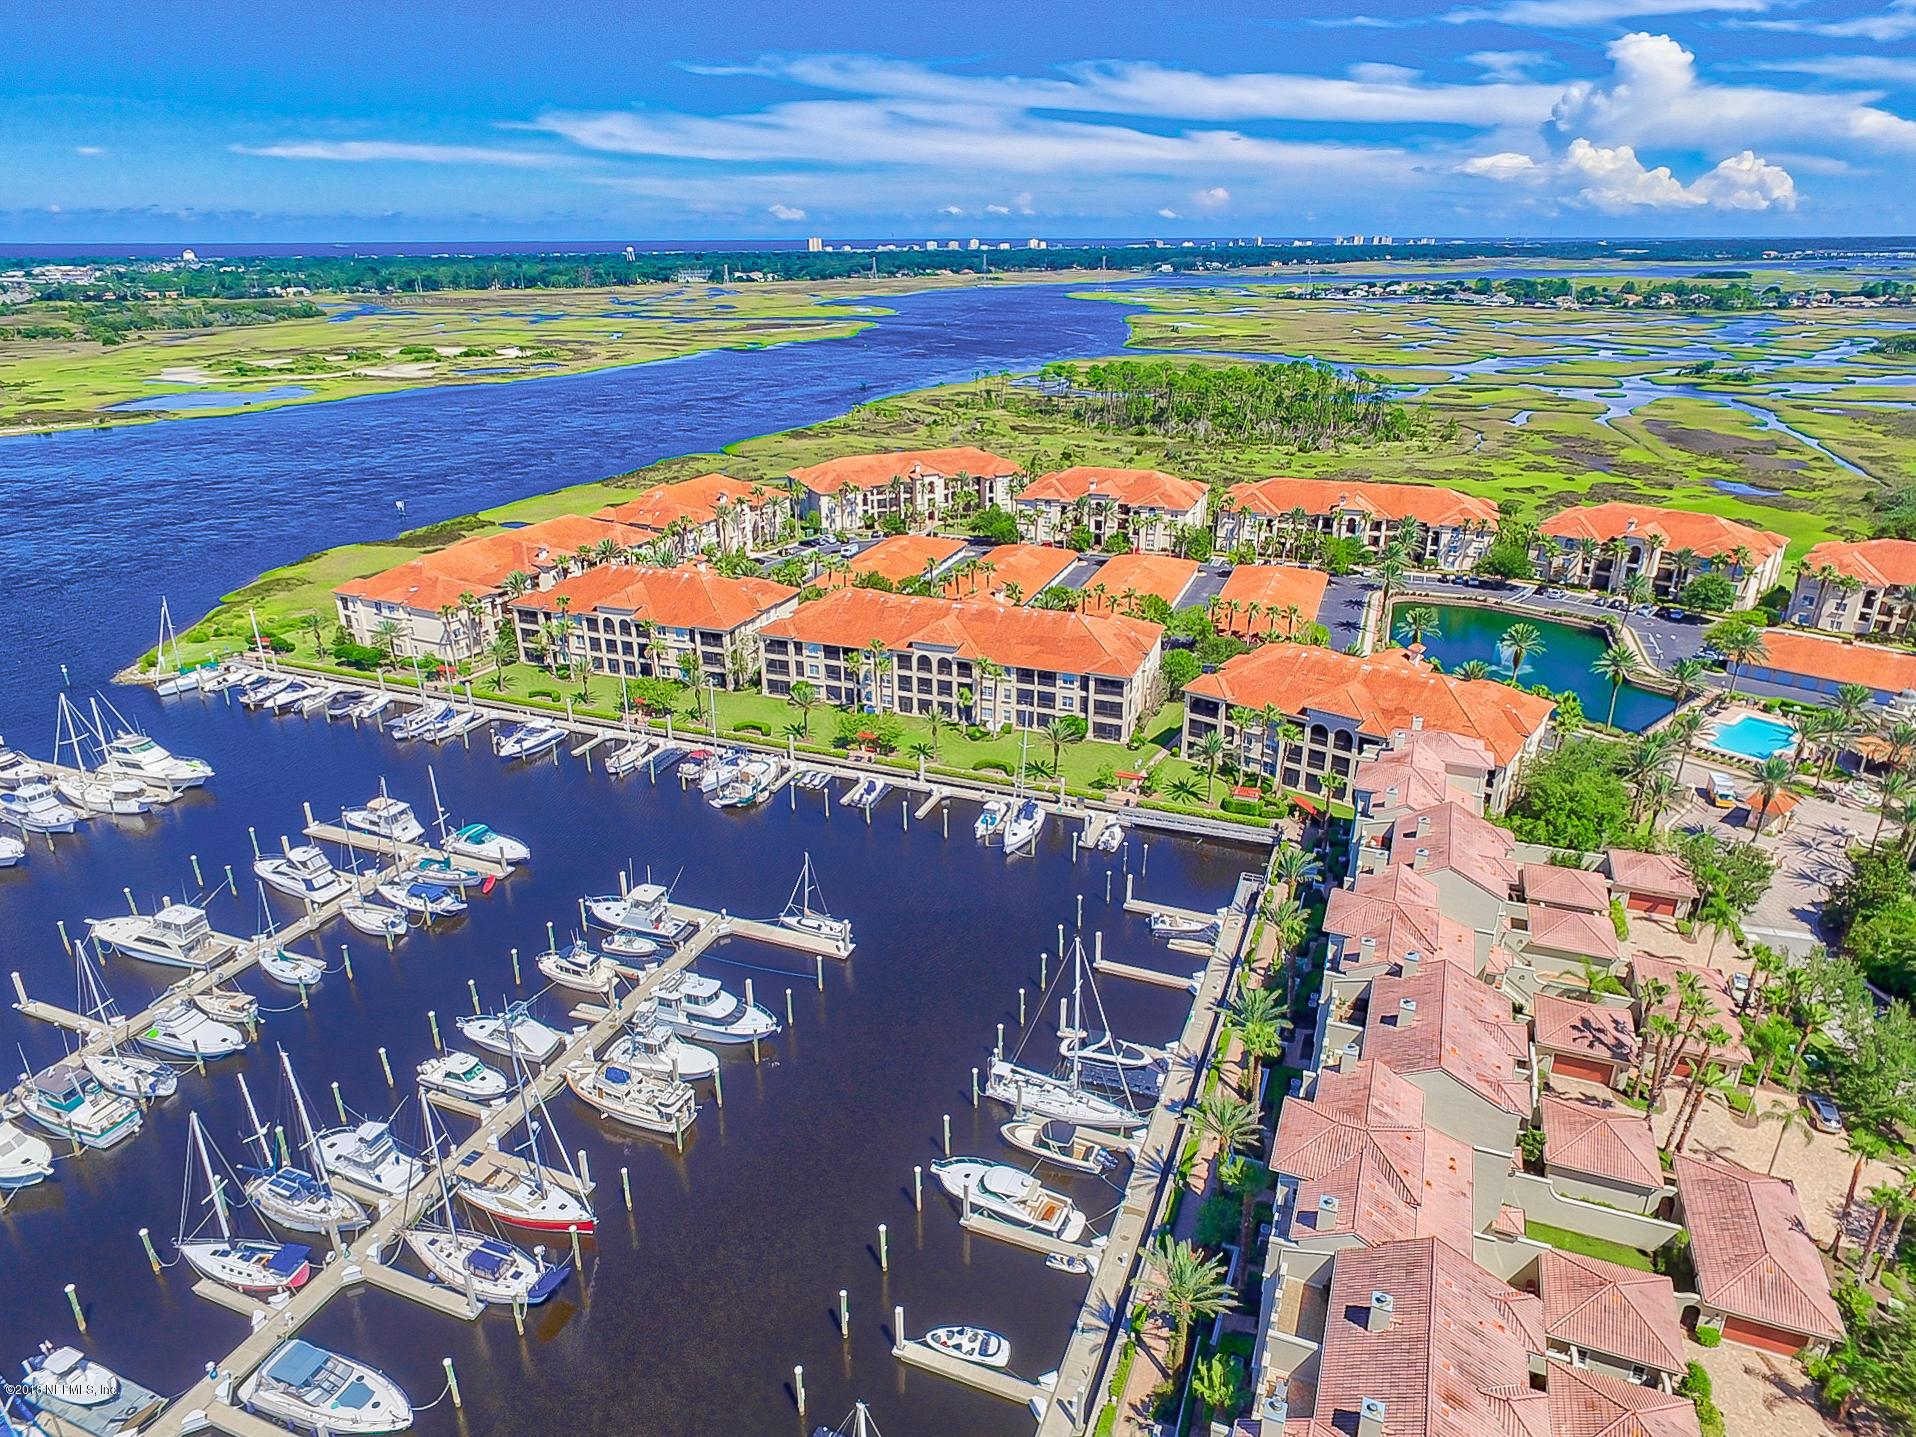 0 ATLANTIC, JACKSONVILLE, FLORIDA 32224, ,Condo,For sale,ATLANTIC,999967